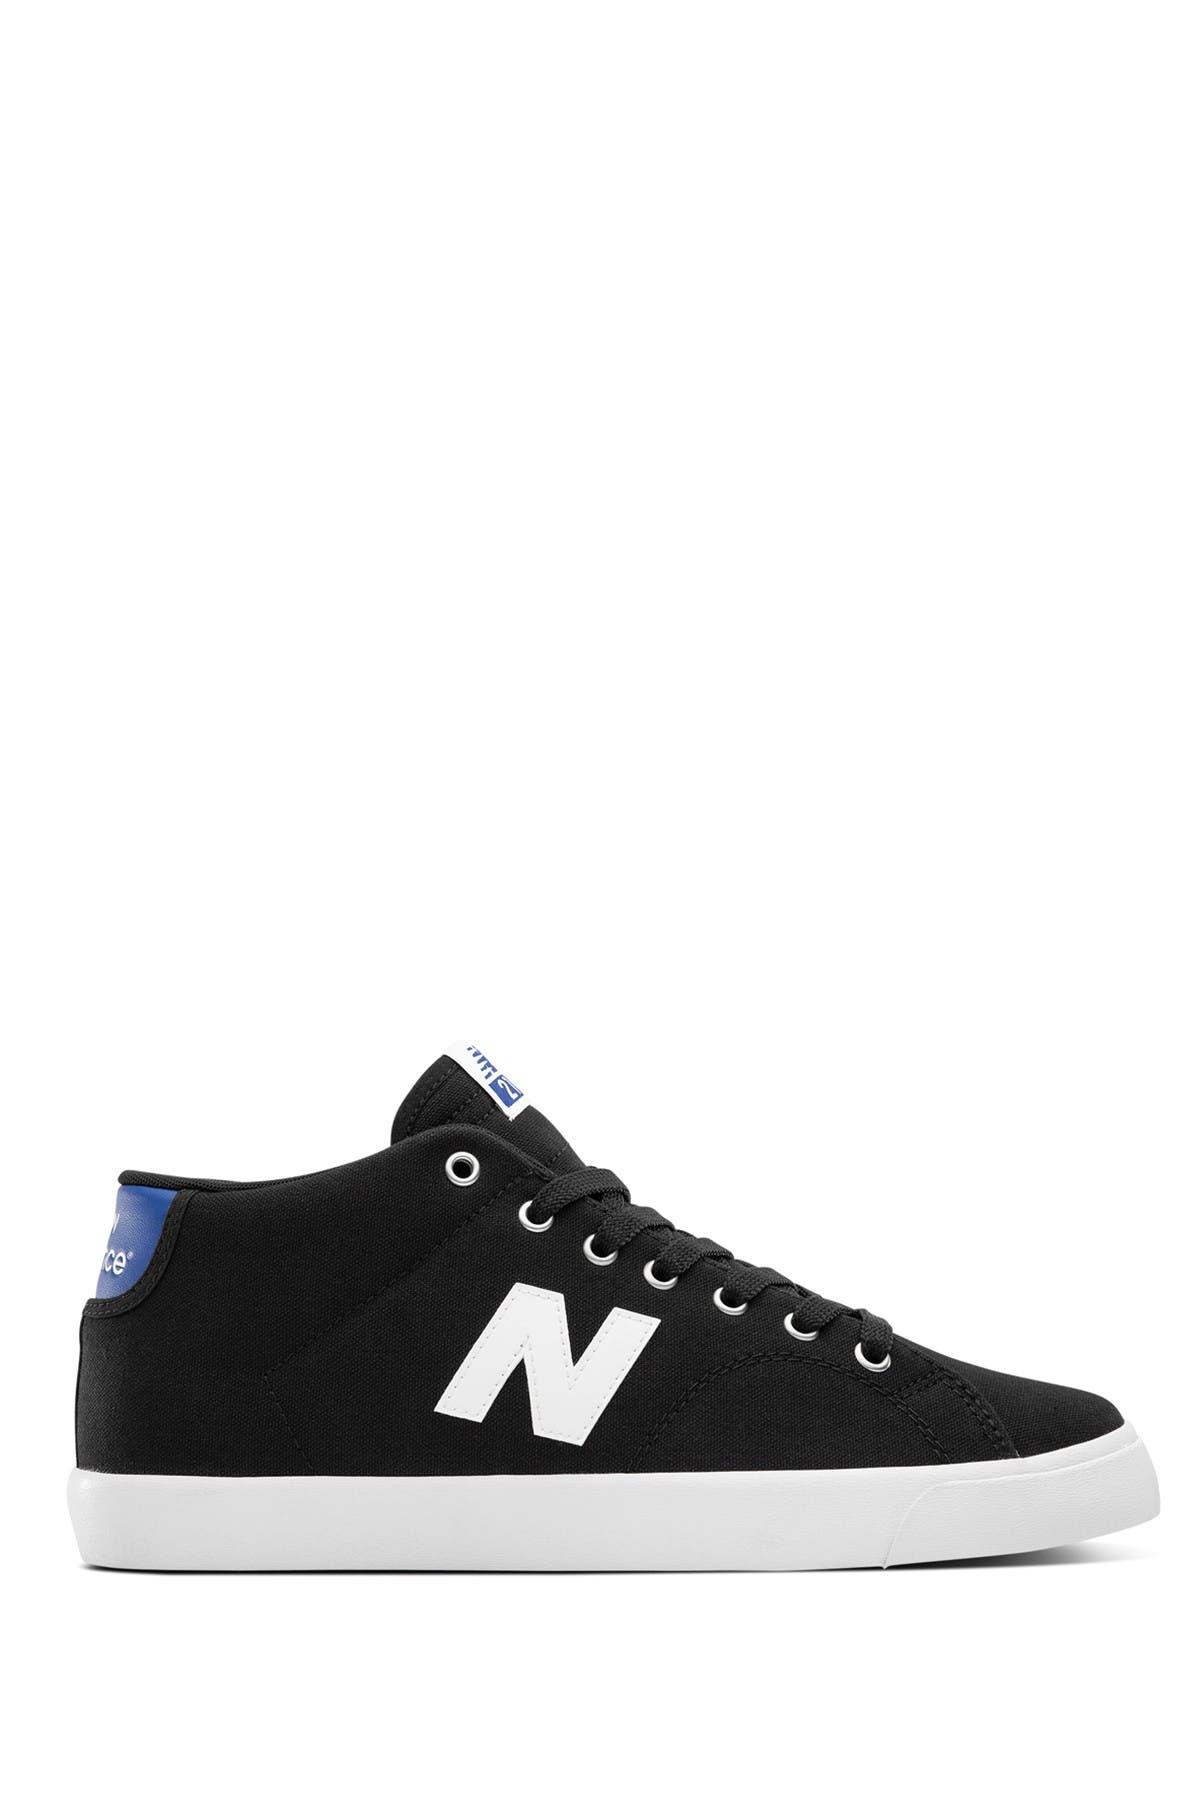 New Balance   All Coast 201 Sneaker   Nordstrom Rack